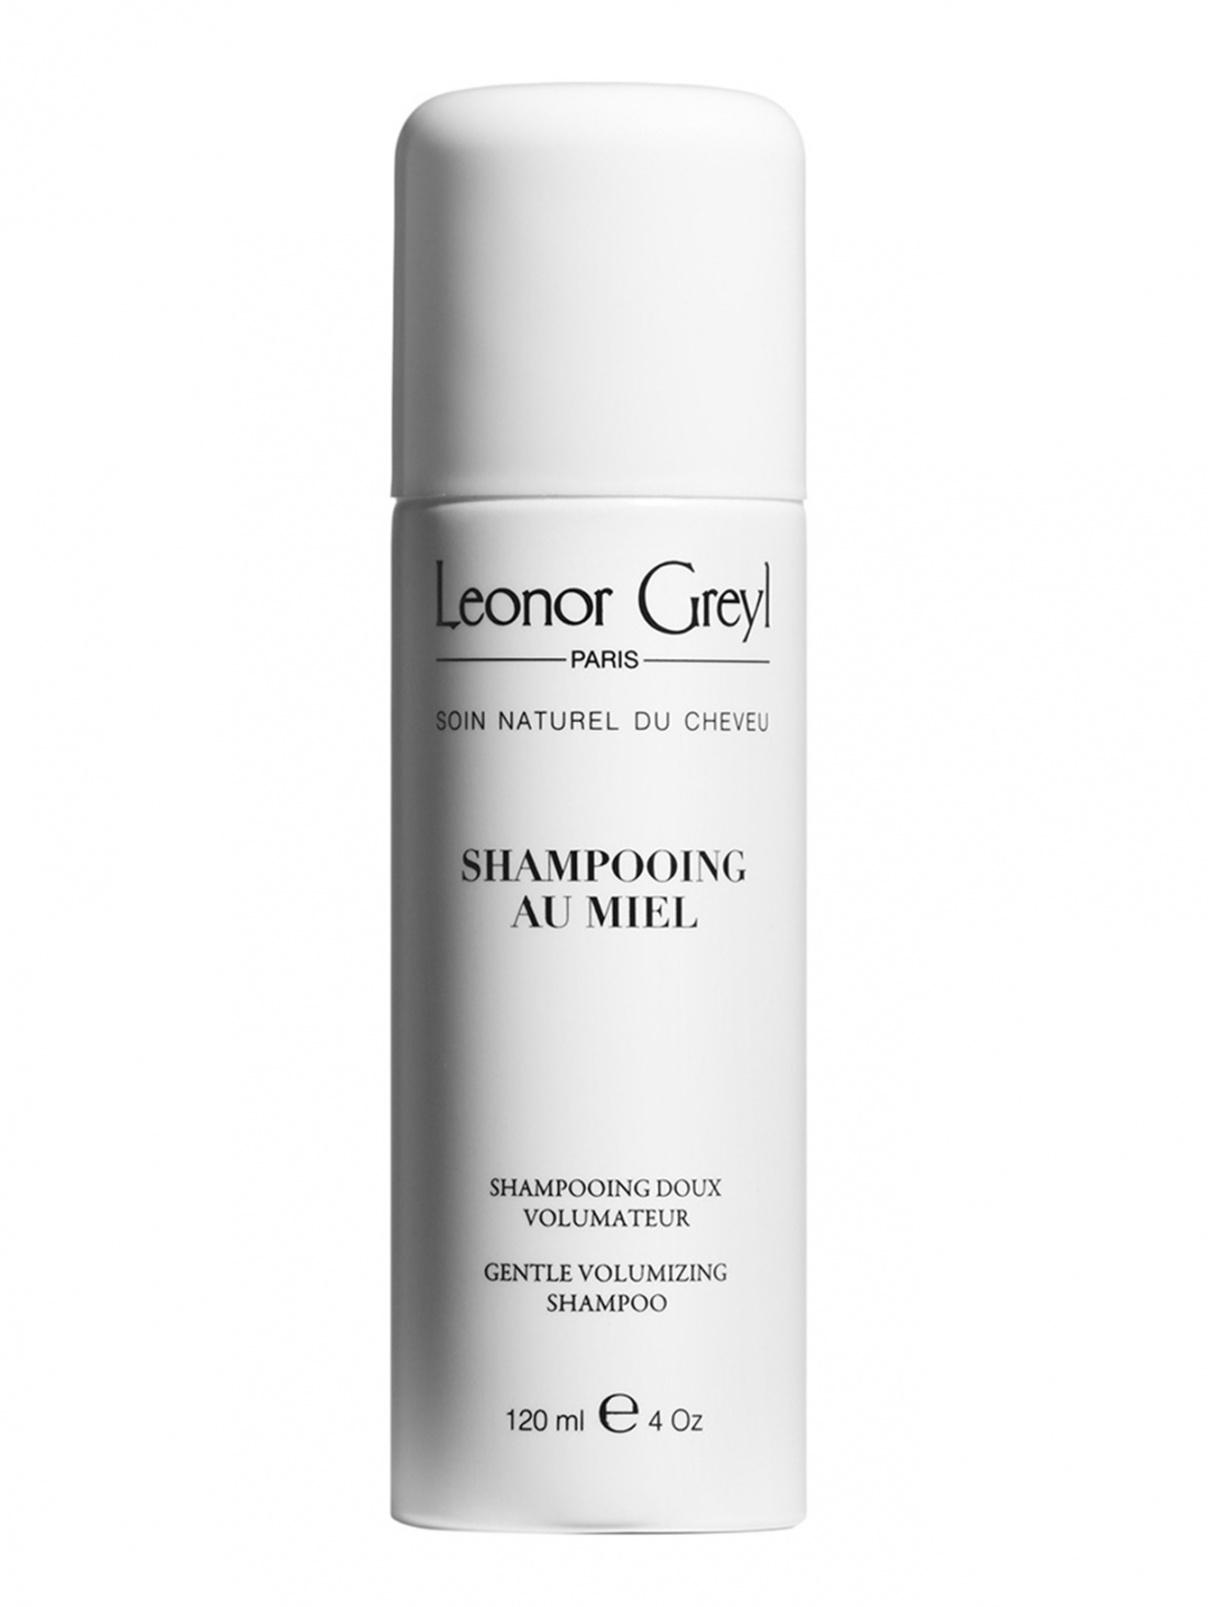 Шампунь с медом - Hair Care, 120ml Leonor Greyl  –  Общий вид